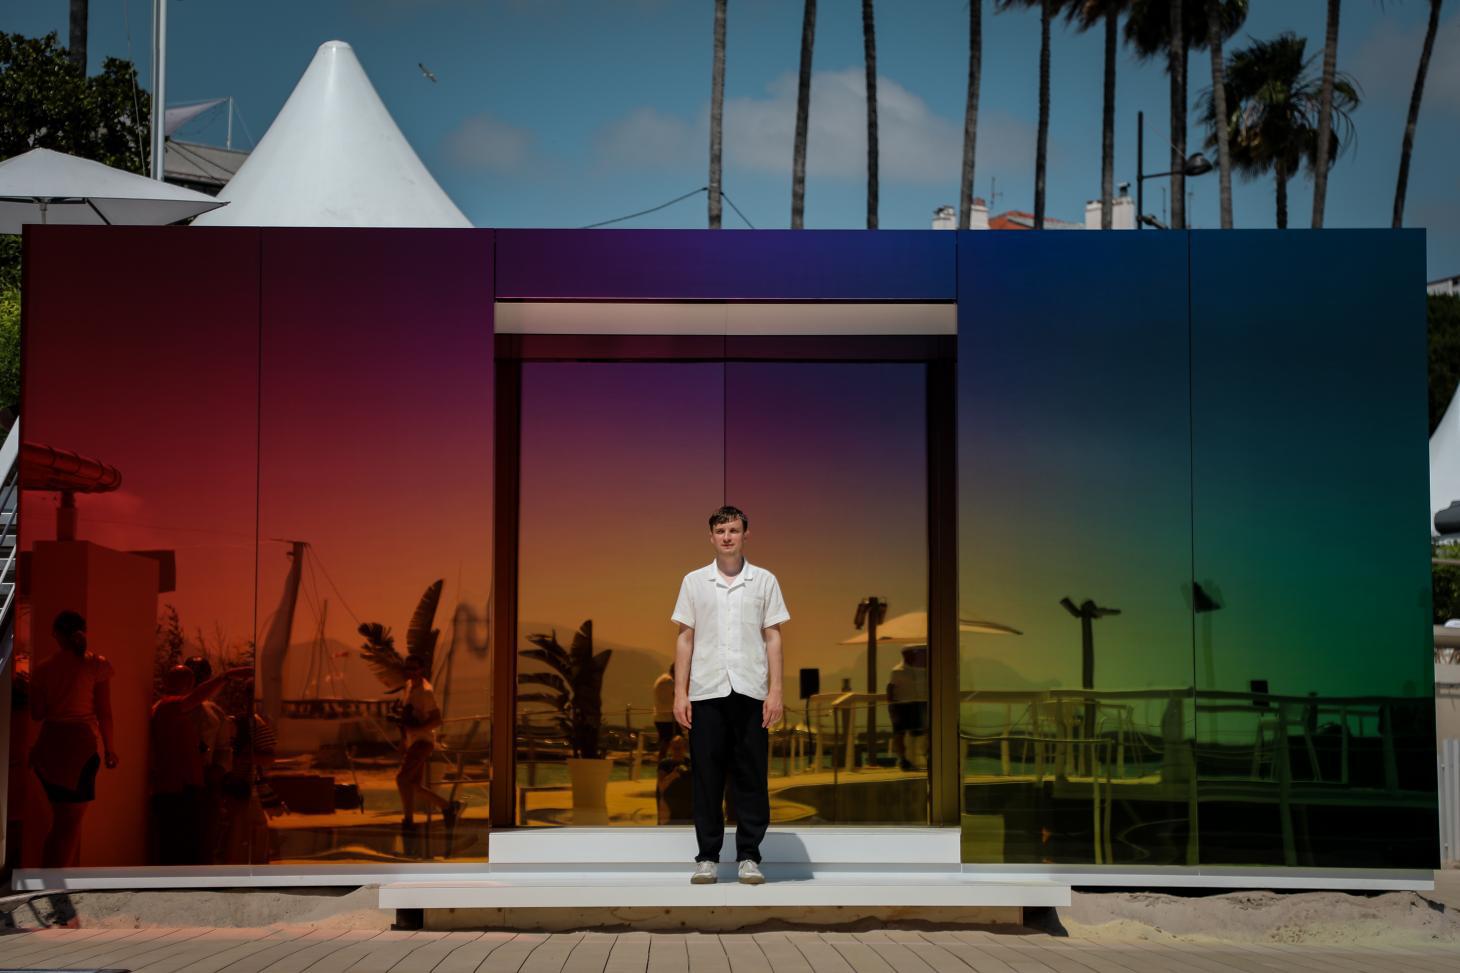 Germans Ermičs designed 'Where the Rainbow Ends' pavilion for Instagram in Cannes